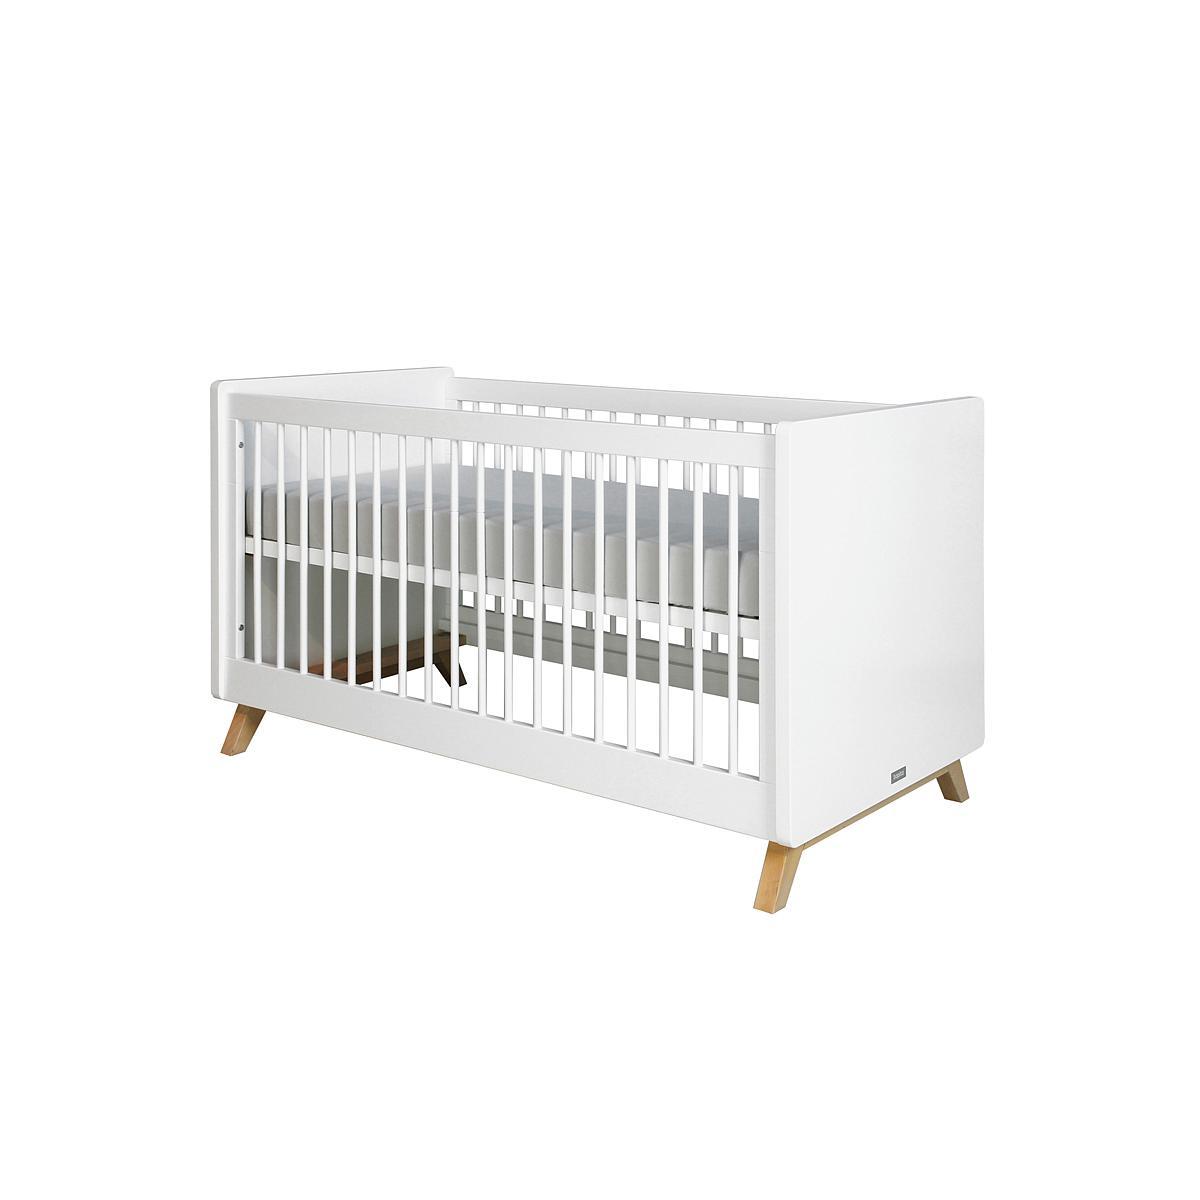 Lit bébé 70x140 cm LYNN BOPITA blanc - naturel